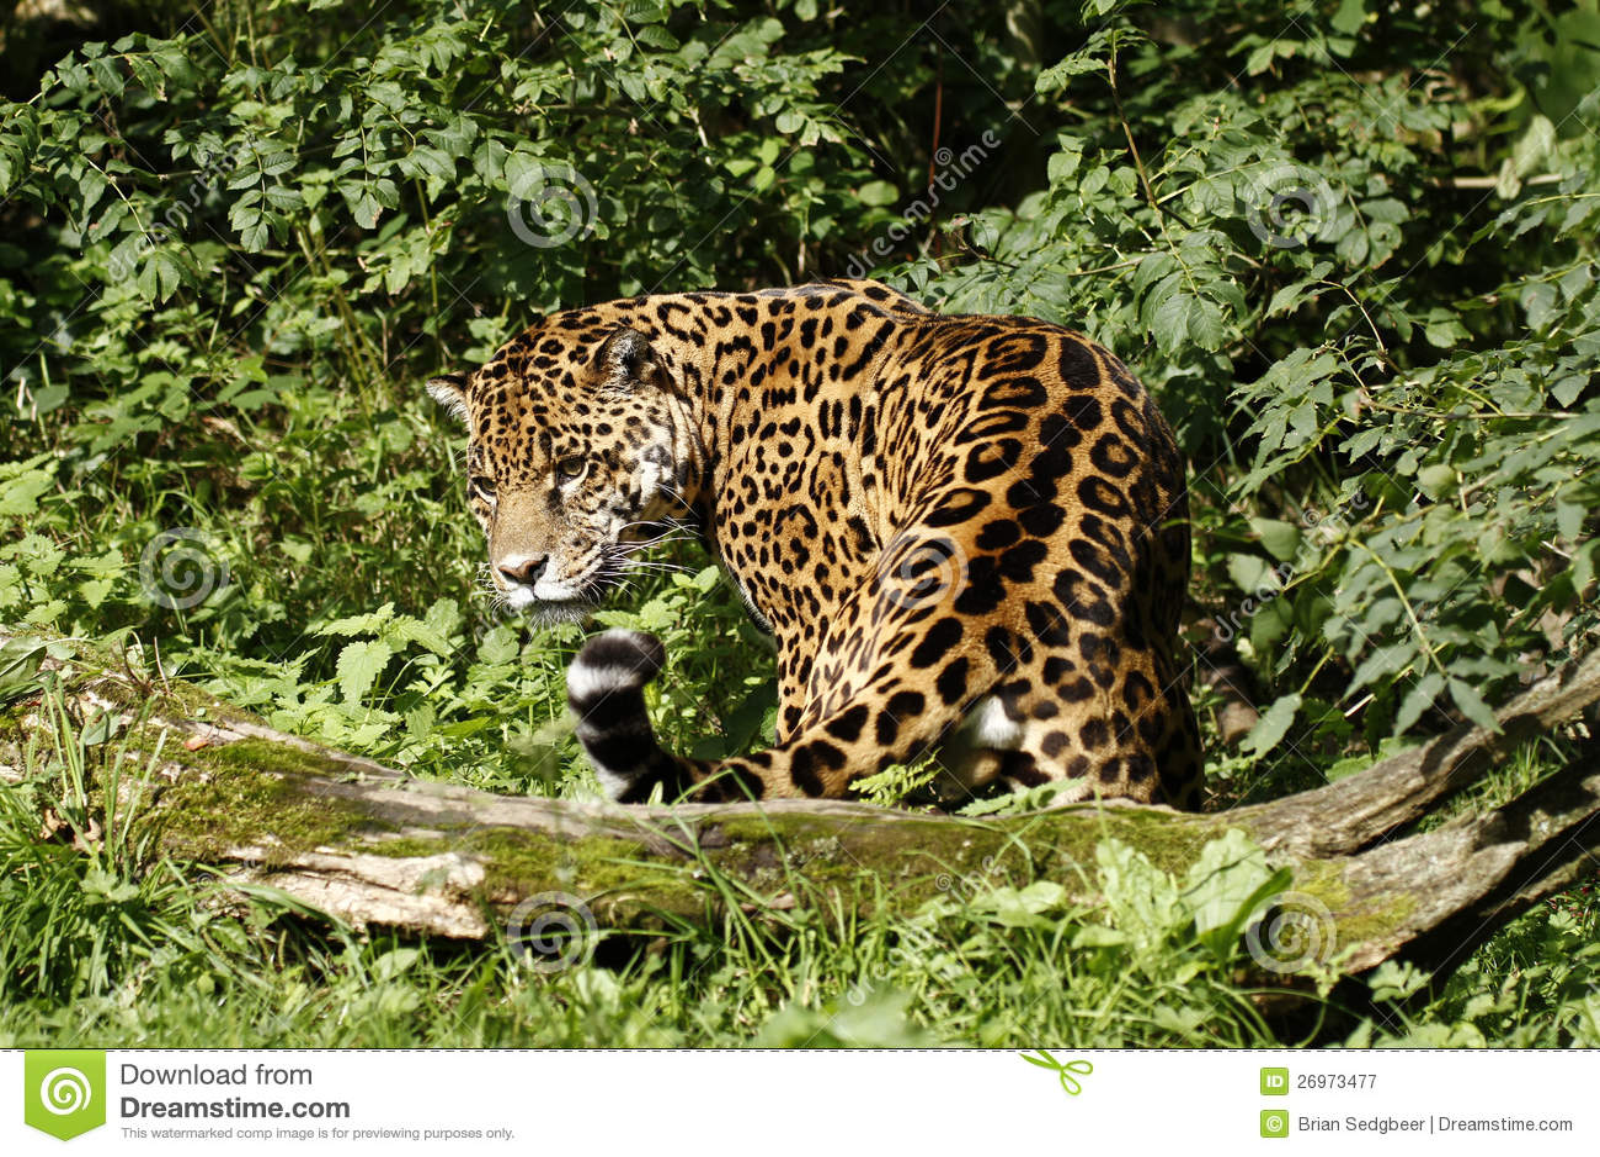 Jaguar formidable